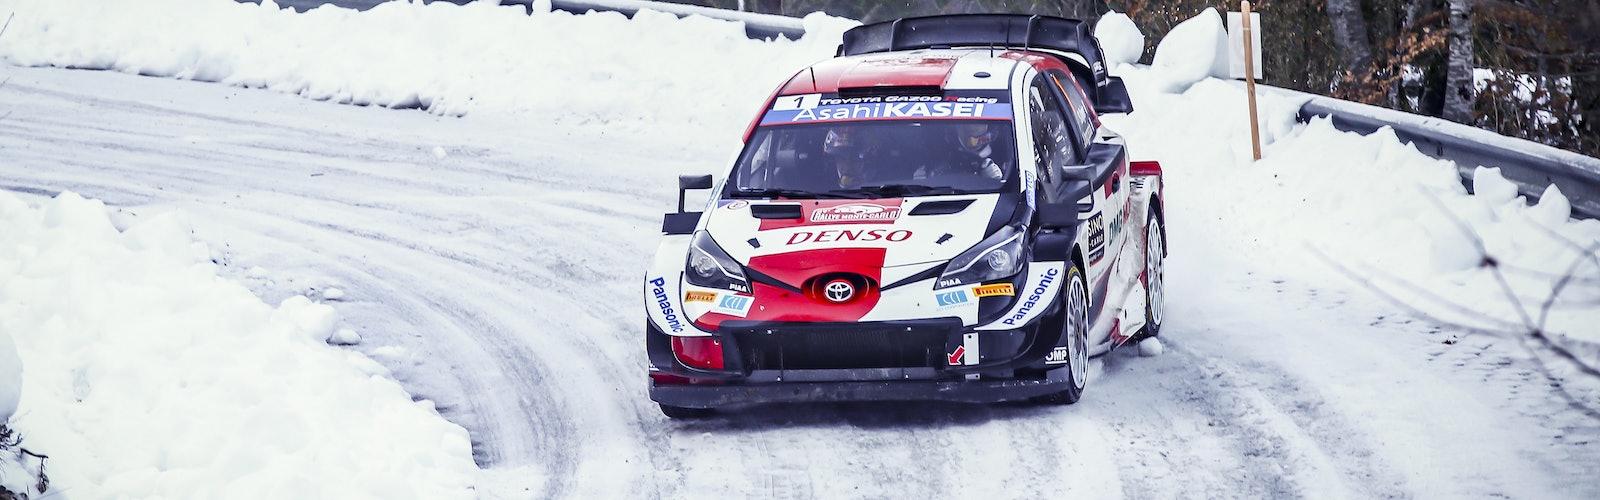 WRC_2021_Rd1._271